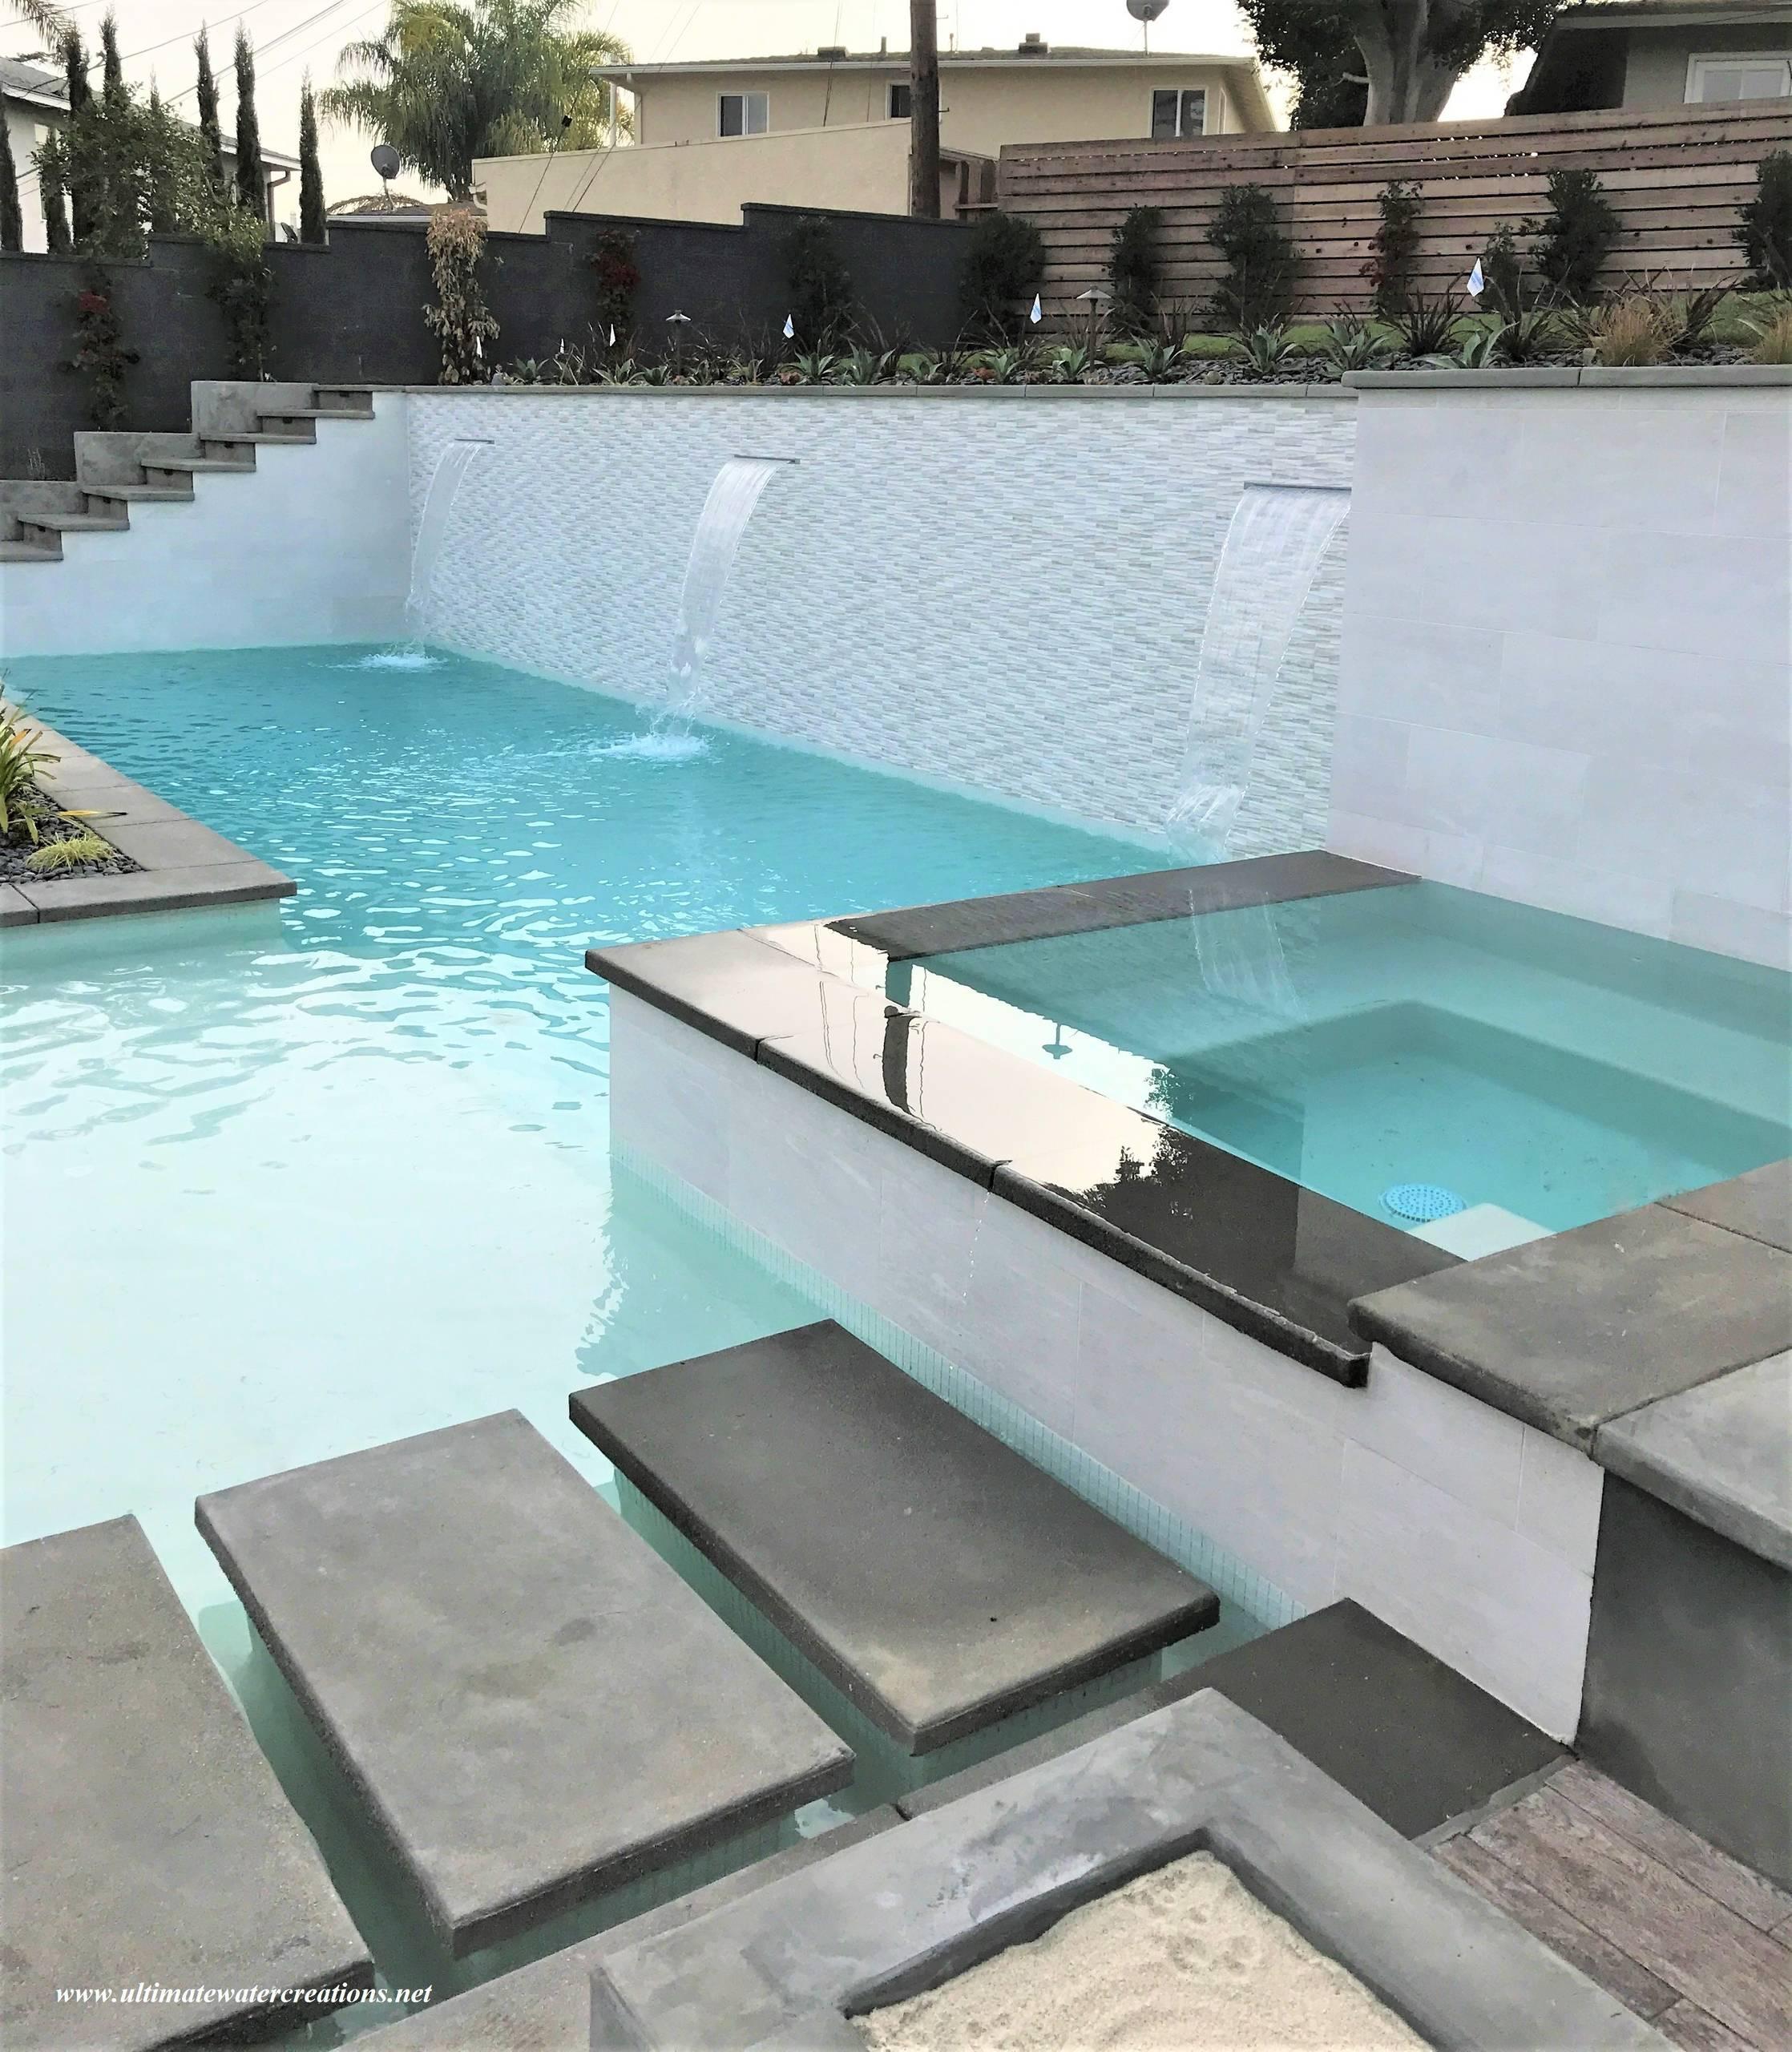 Los Angeles - Contemporary Black & White Rectangular Pool & Spa